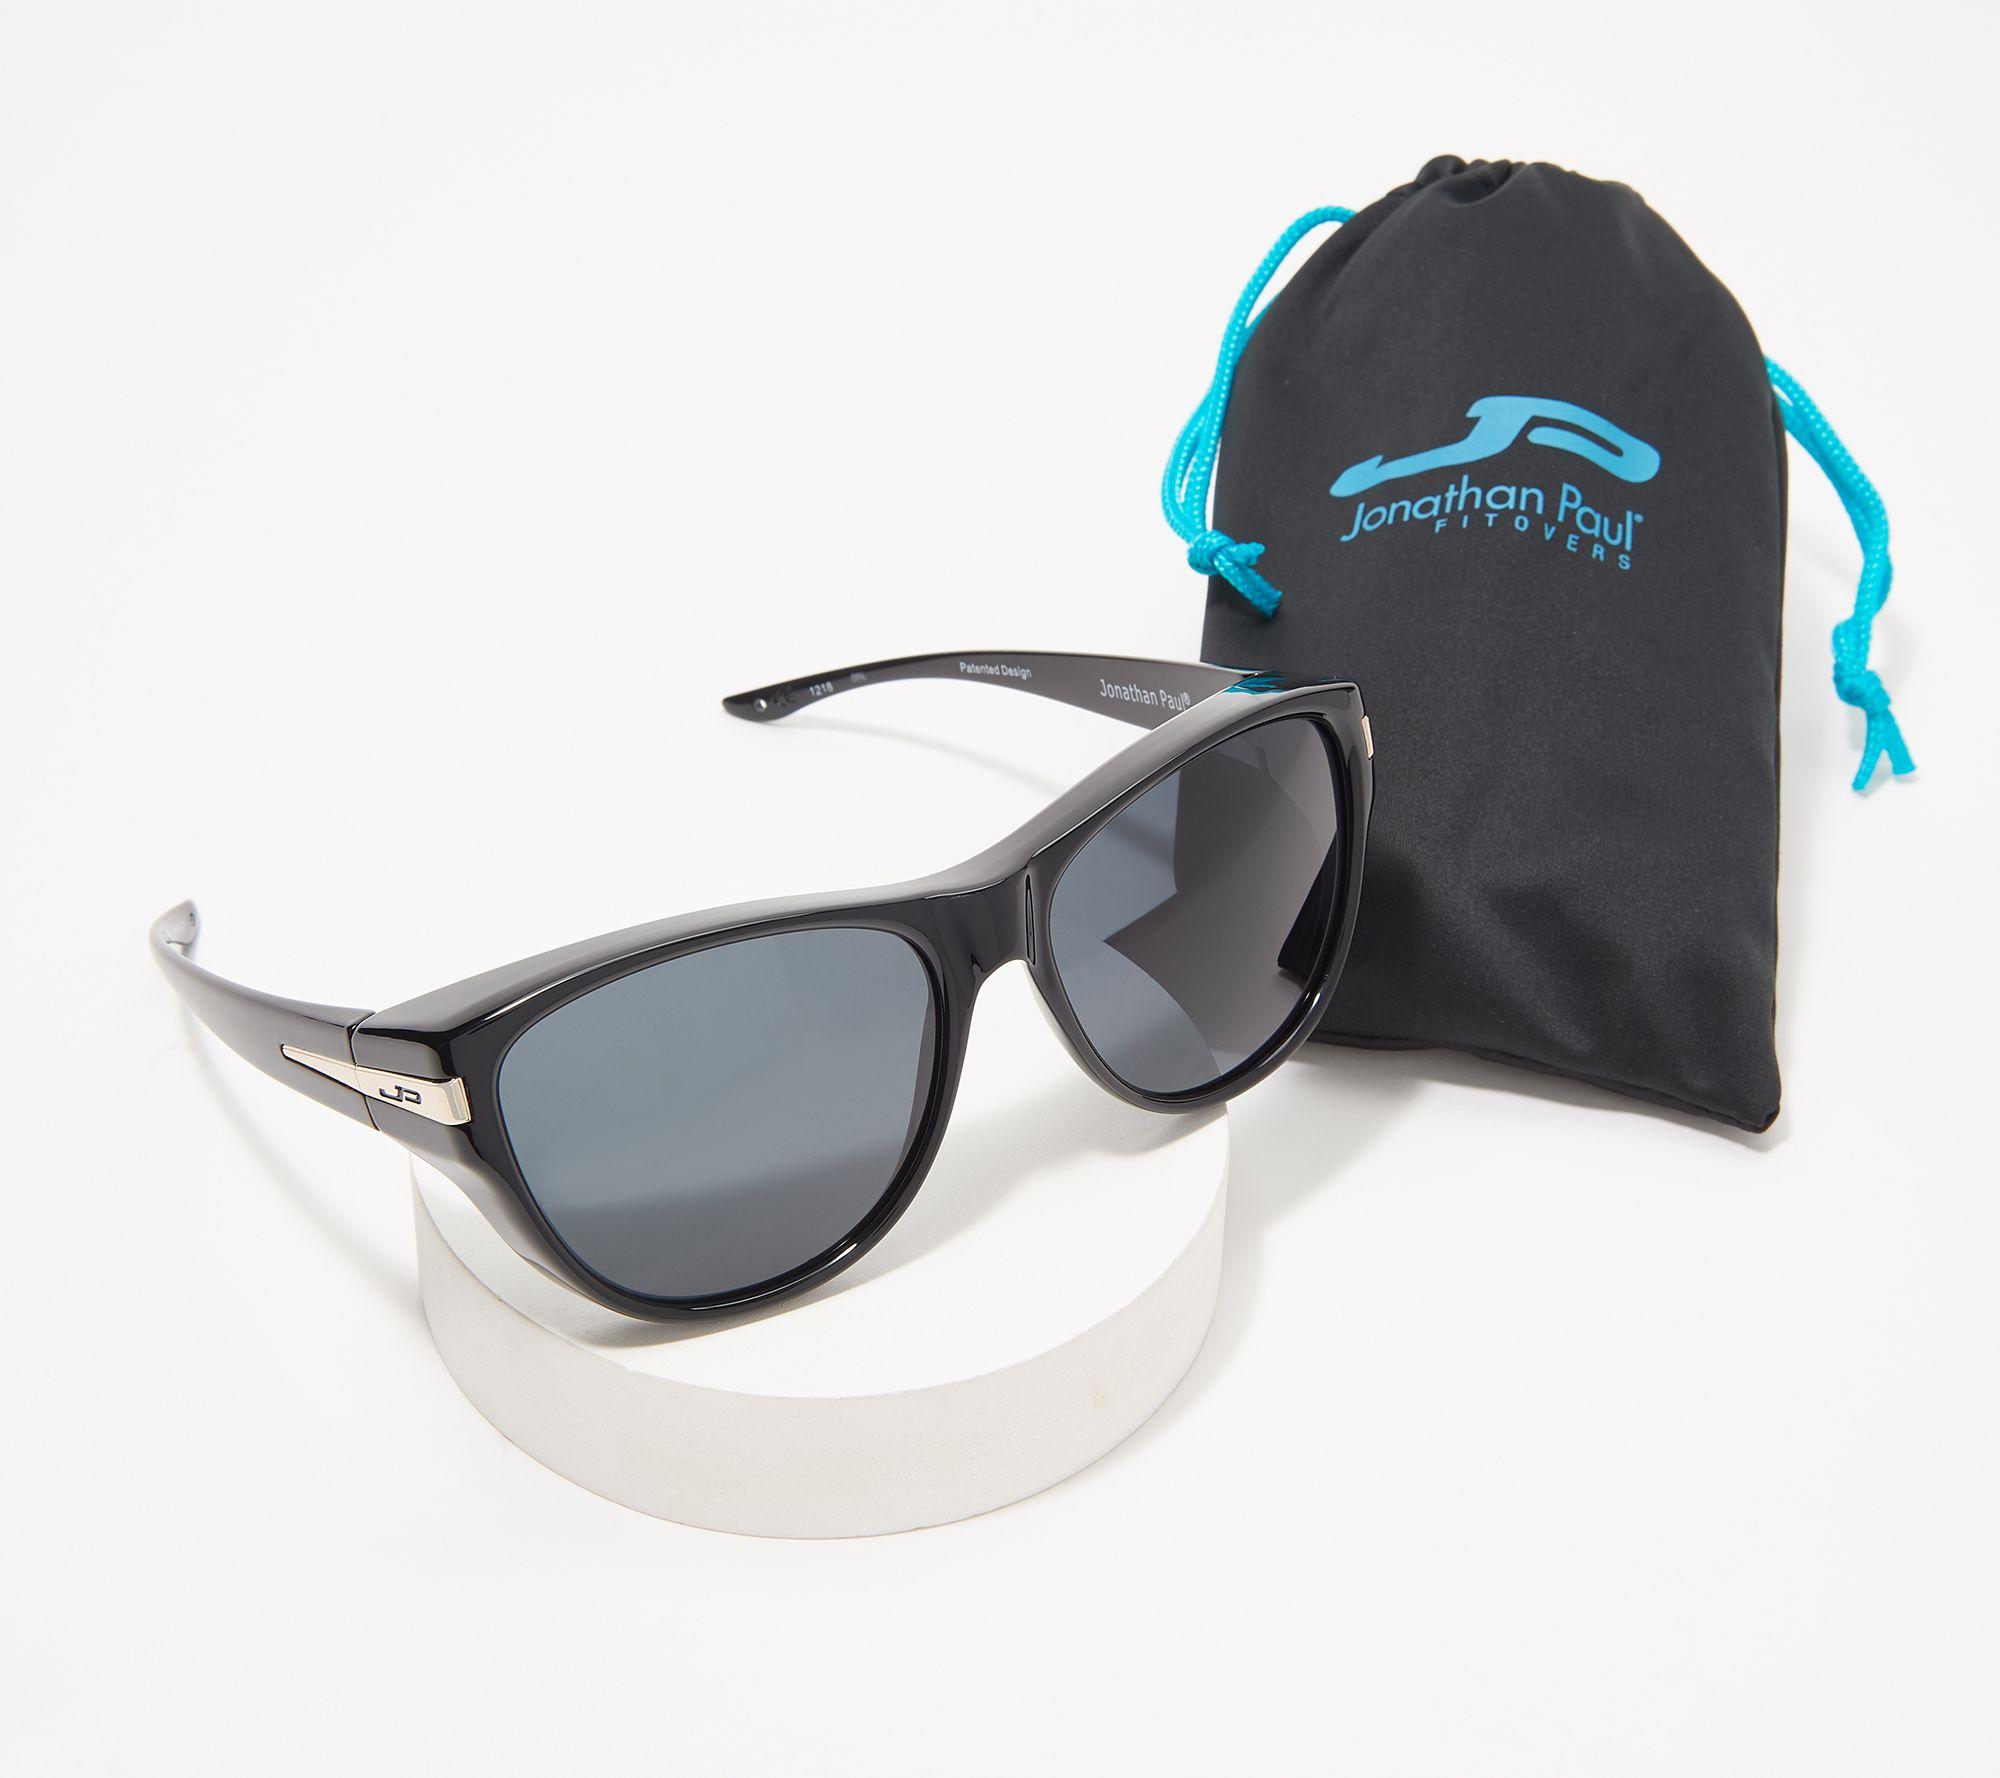 109159c0c55 Jonathan Paul Trendi Fitover Sunglasses with Case - Page 1 — QVC.com